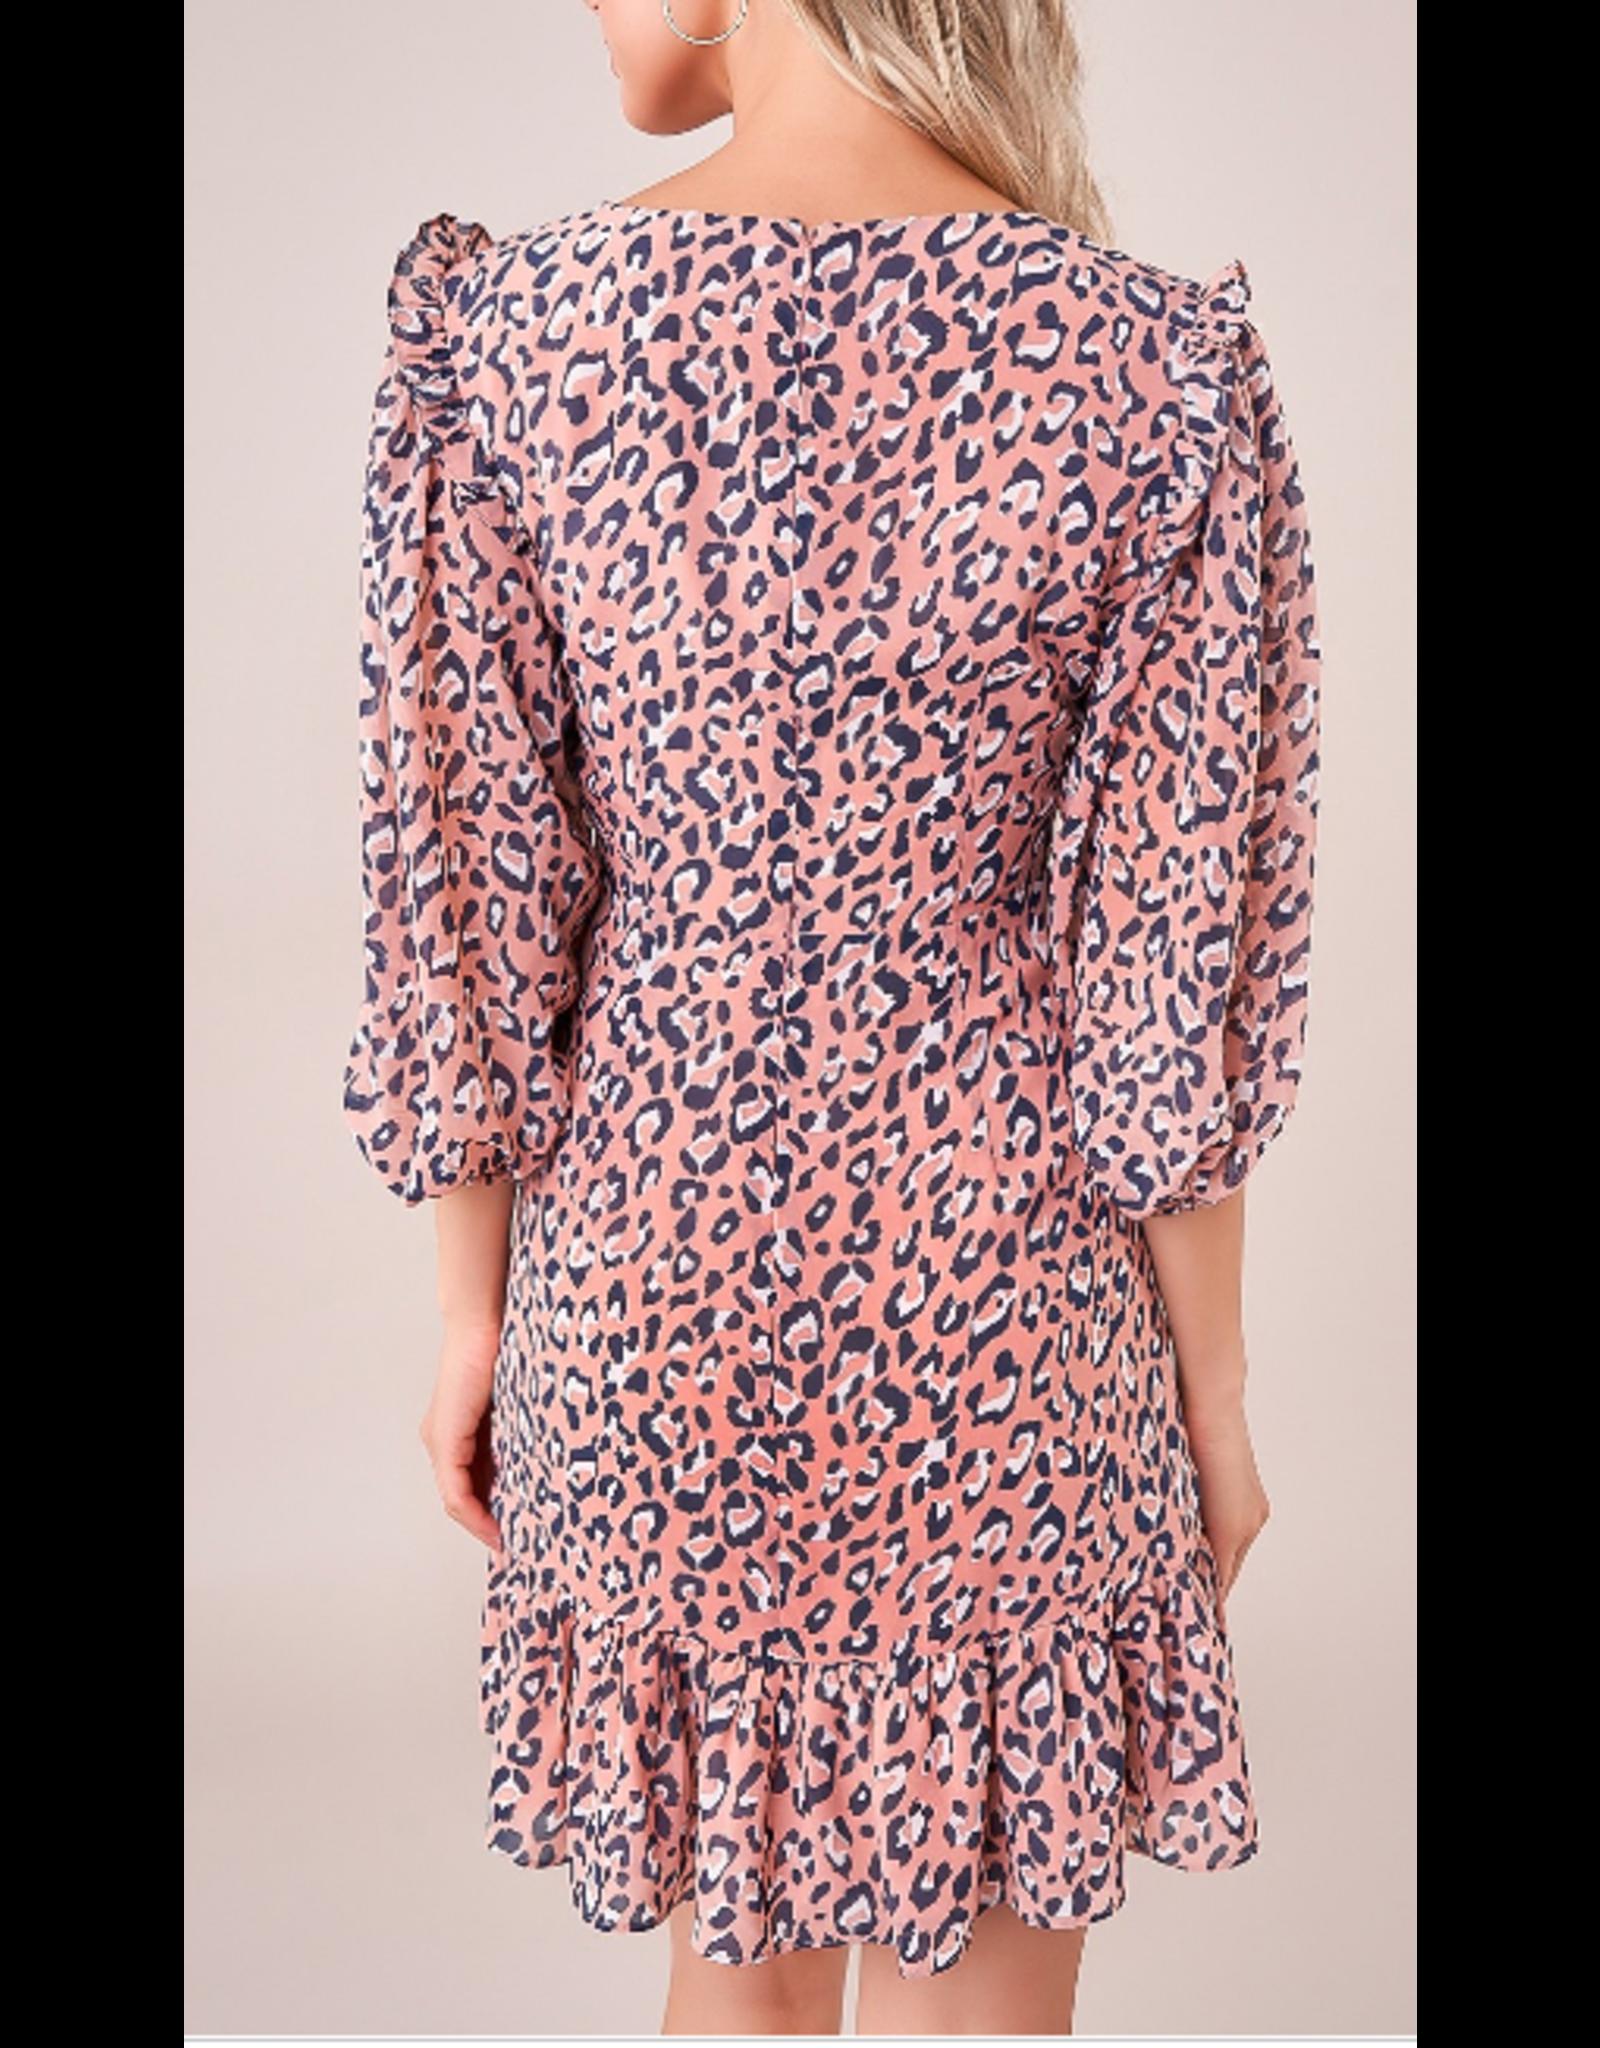 Sugarlips Ruched Ruffle Leopard Dress - PINK